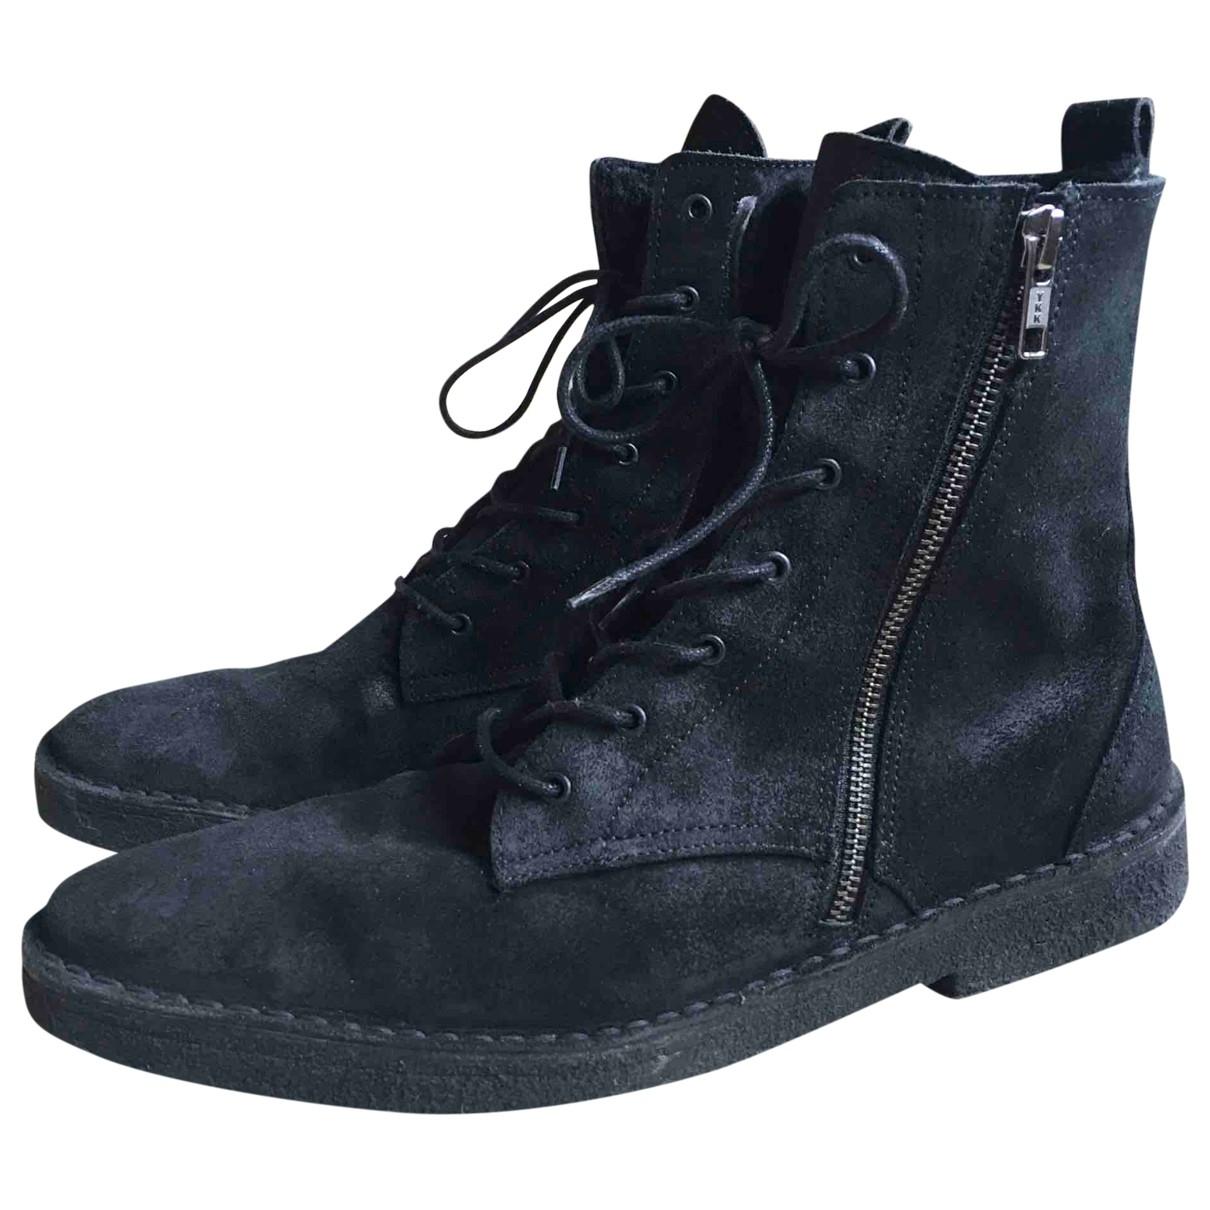 Pierre Hardy \N Black Suede Boots for Men 41 EU